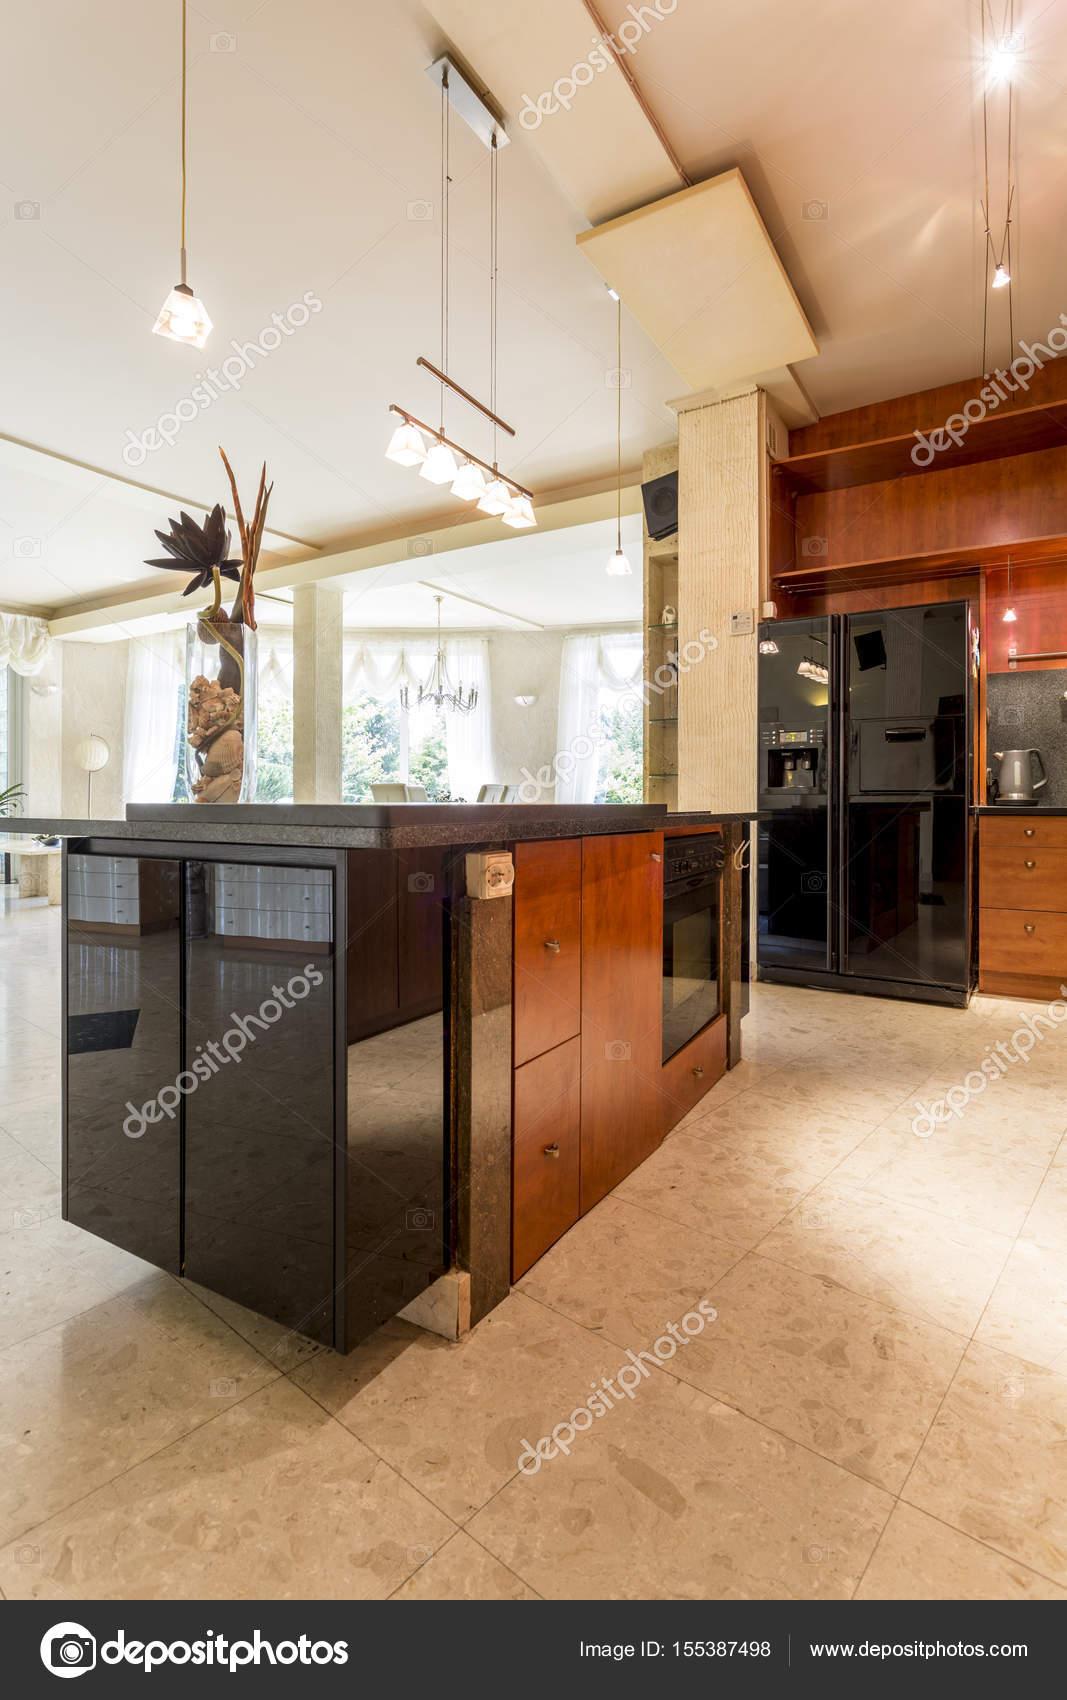 kitchen island lighting rubber flooring 宽敞的开放式厨房 与岛 图库照片 c photographee eu 155387498 木制家具和装饰照明 照片作者photographee